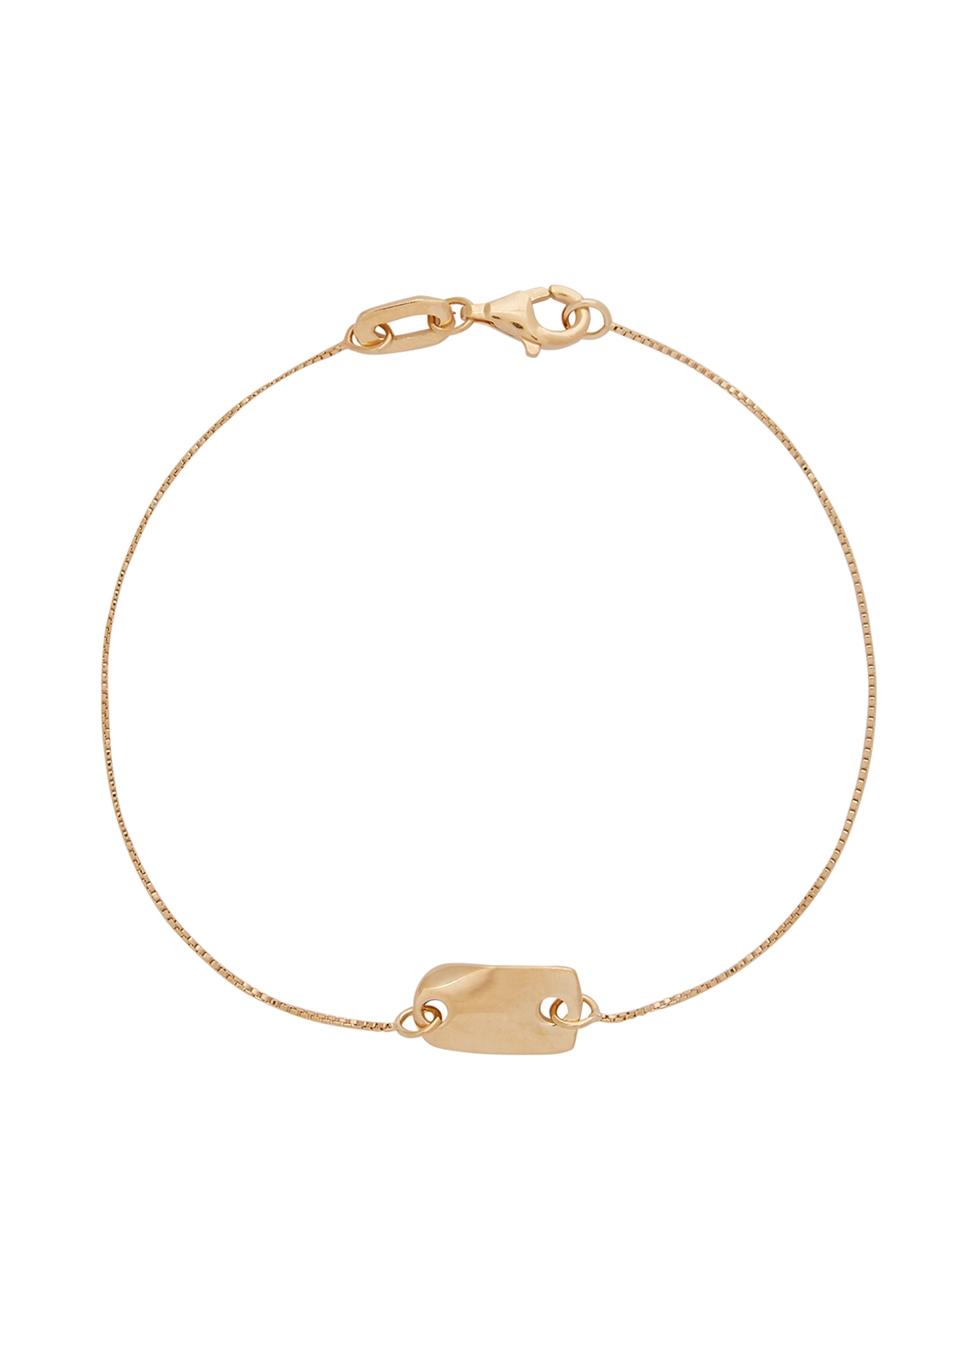 Folded 24kt gold-plated bracelet